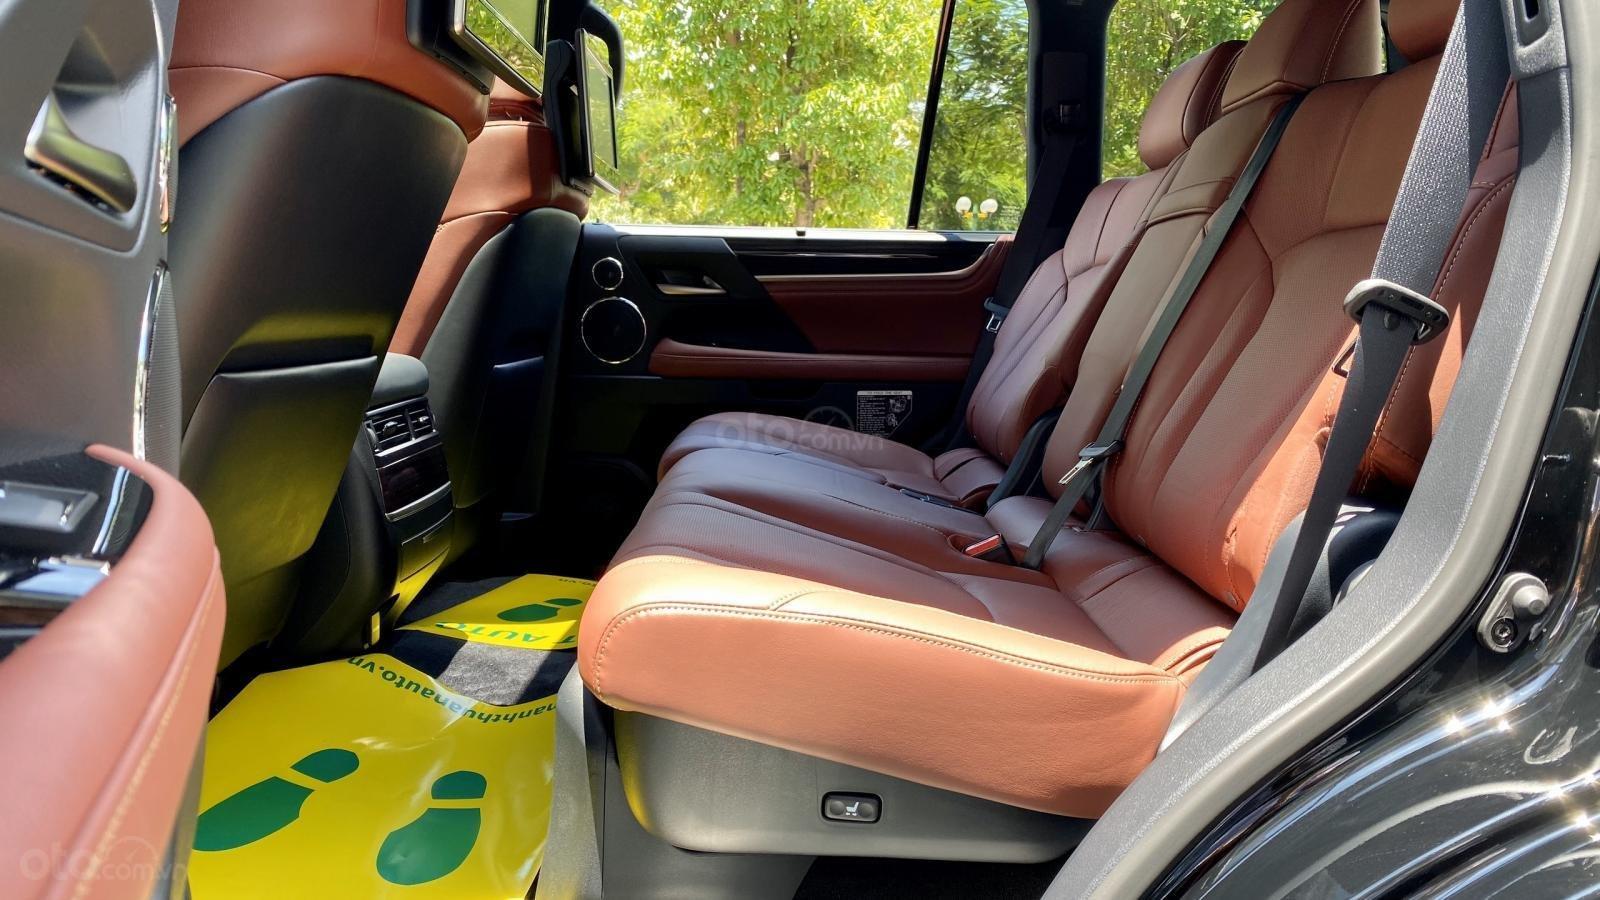 Bán Lexus LX 570s Supper Sport SX 2020, màu đen, xe nhập Mỹ mới 100% (10)